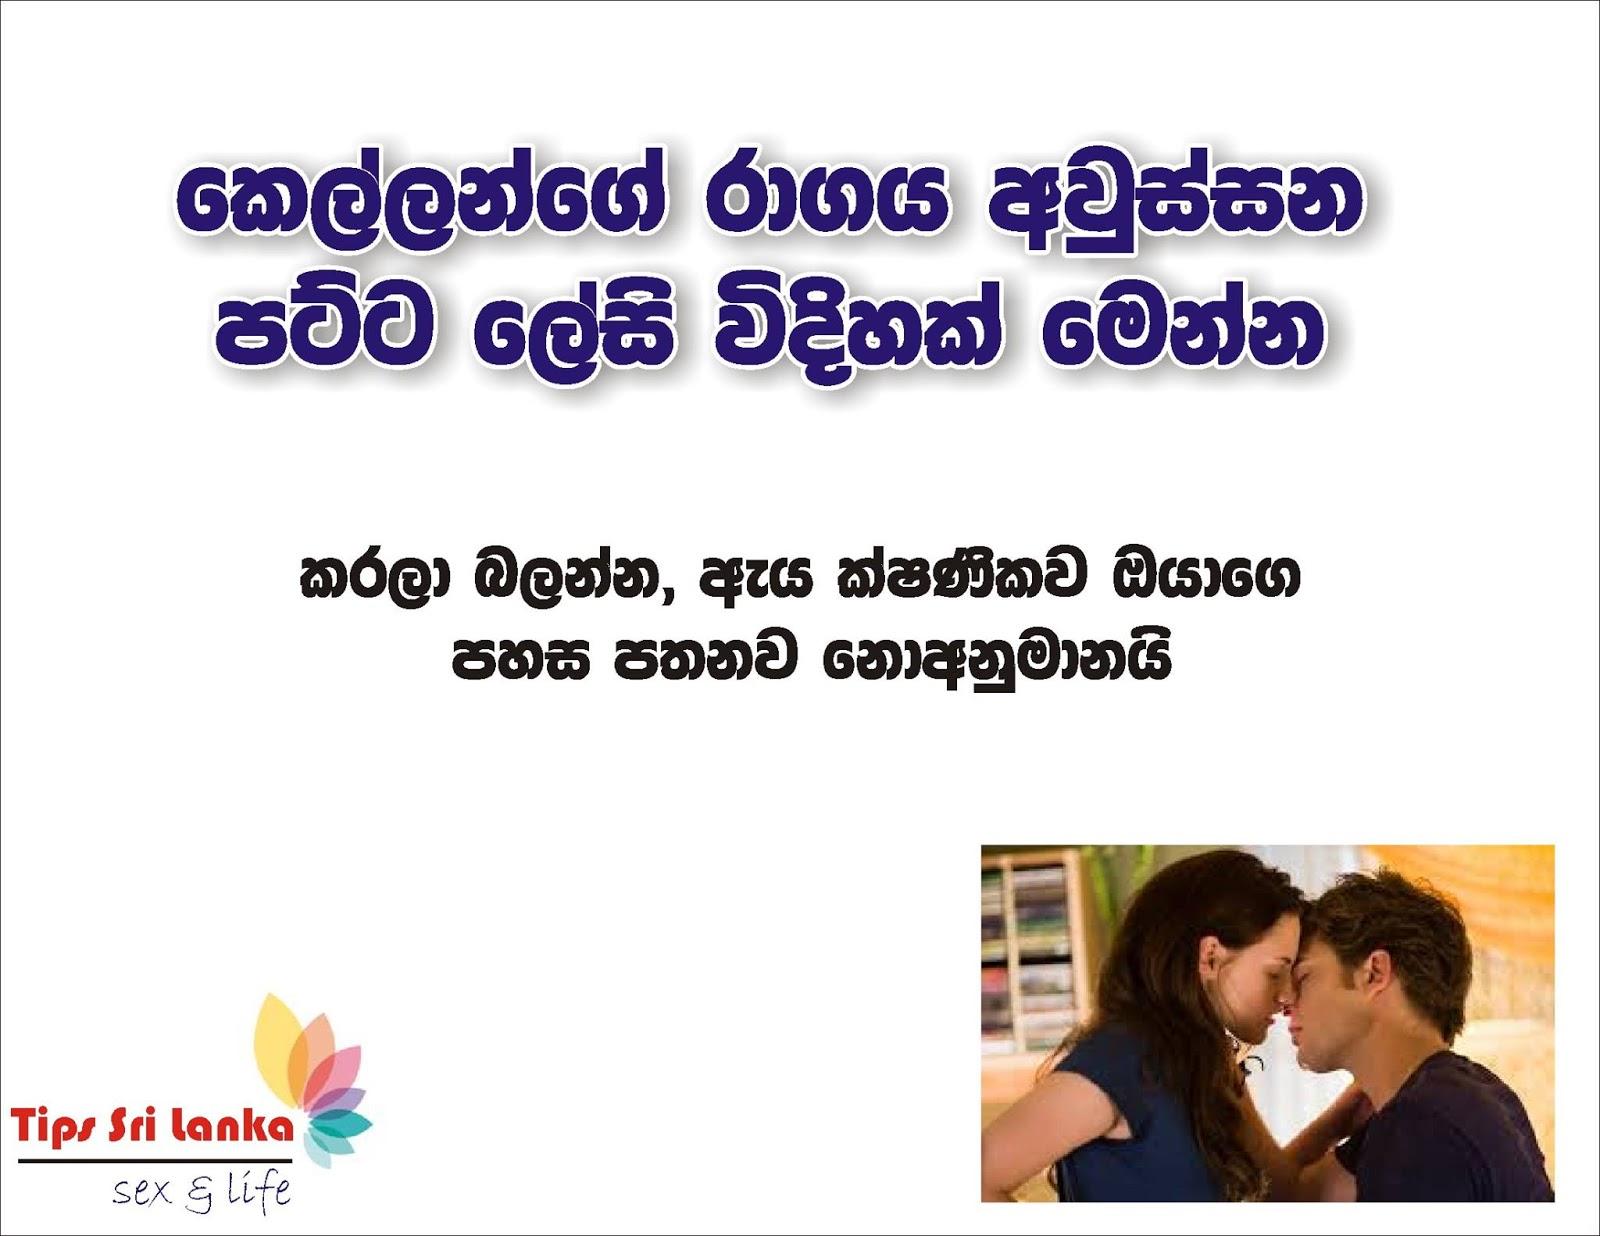 Sinhala gay sex videos and warm